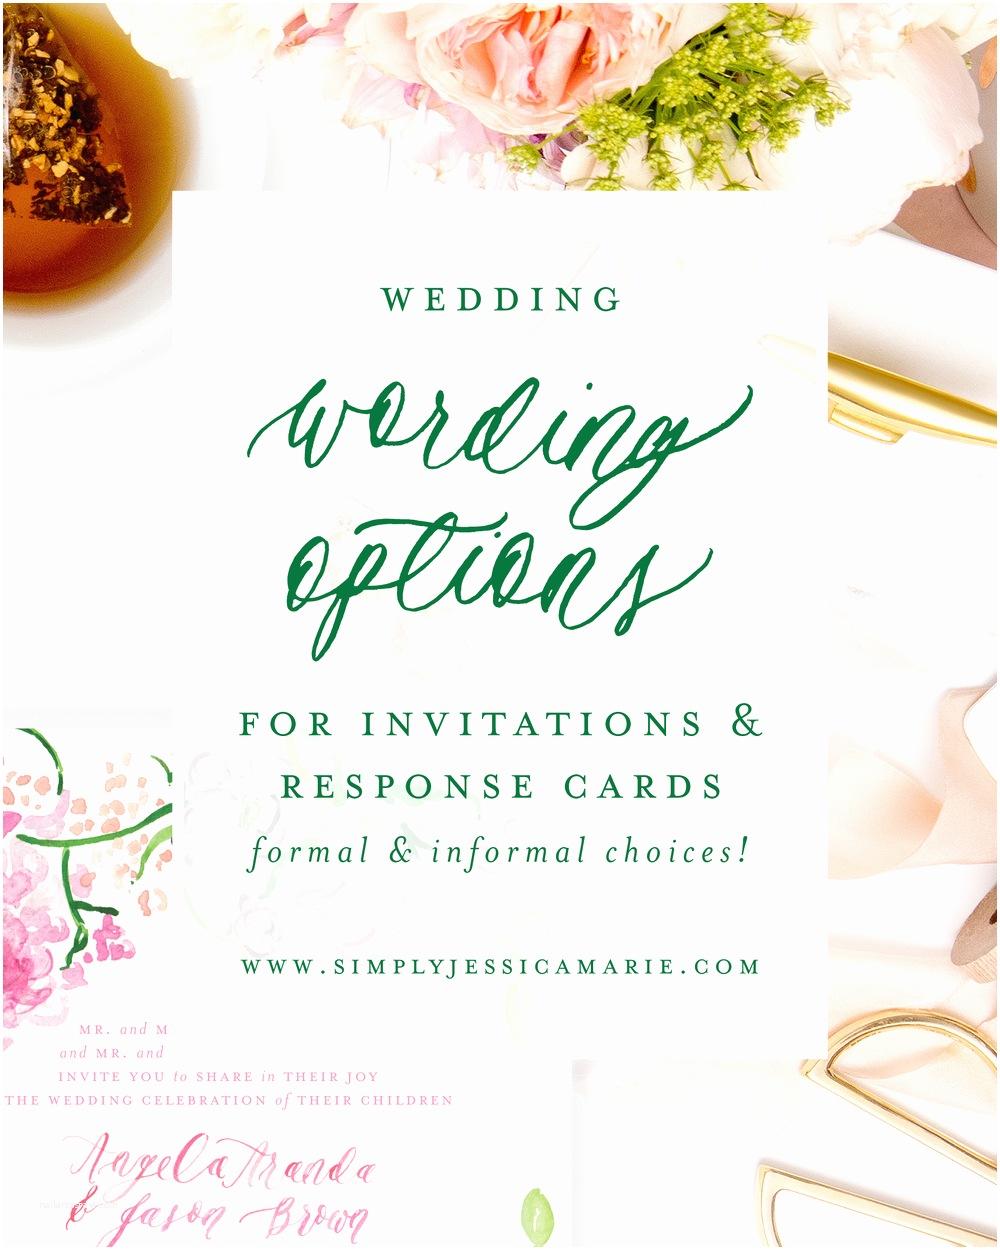 Wedding Invitation Verses Wording Options For Wedding Invitations — Simply Jessica